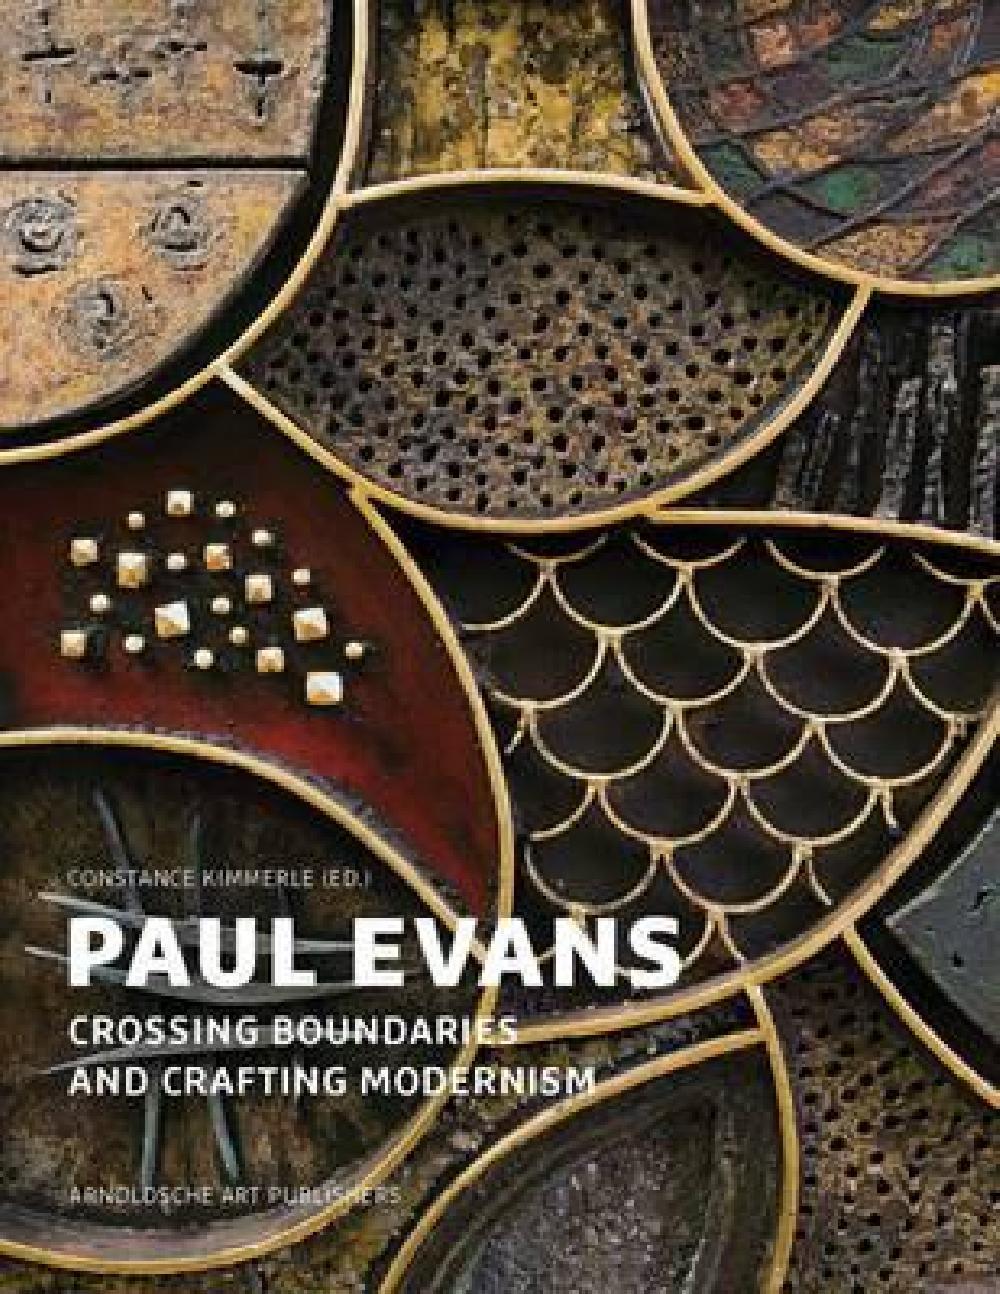 Paul Evans Crossing Boundaries and Crafting Modernism